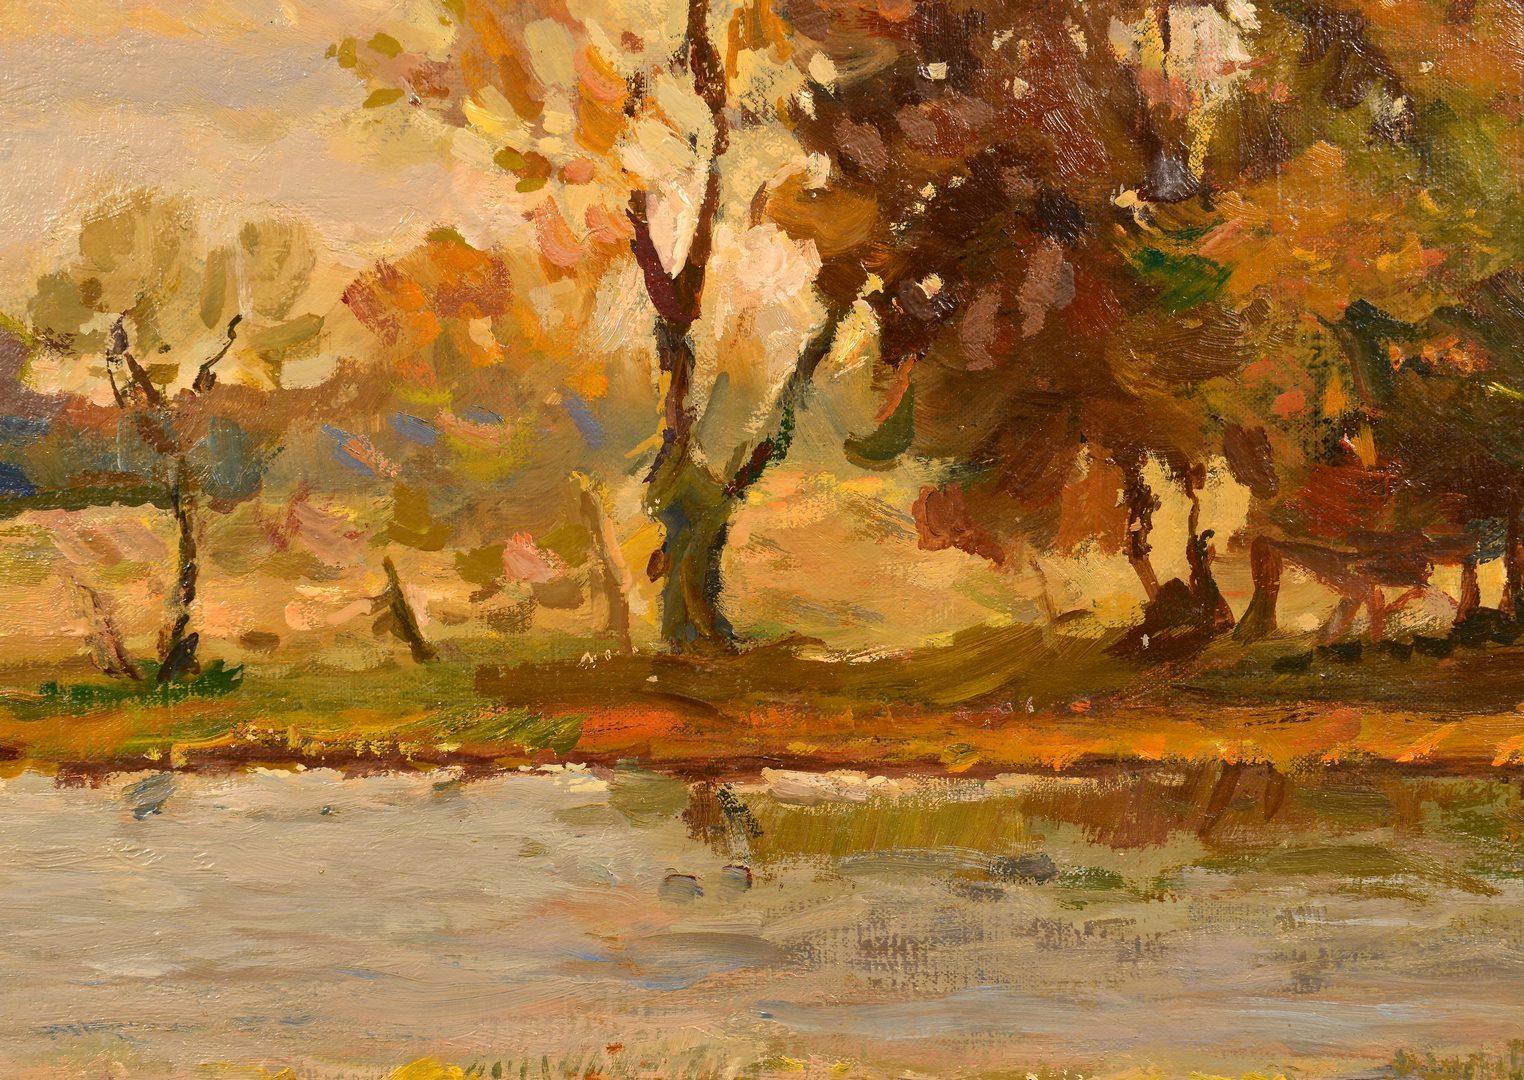 Lot 638: G. Stepanyants, oil on canvas, Landscape